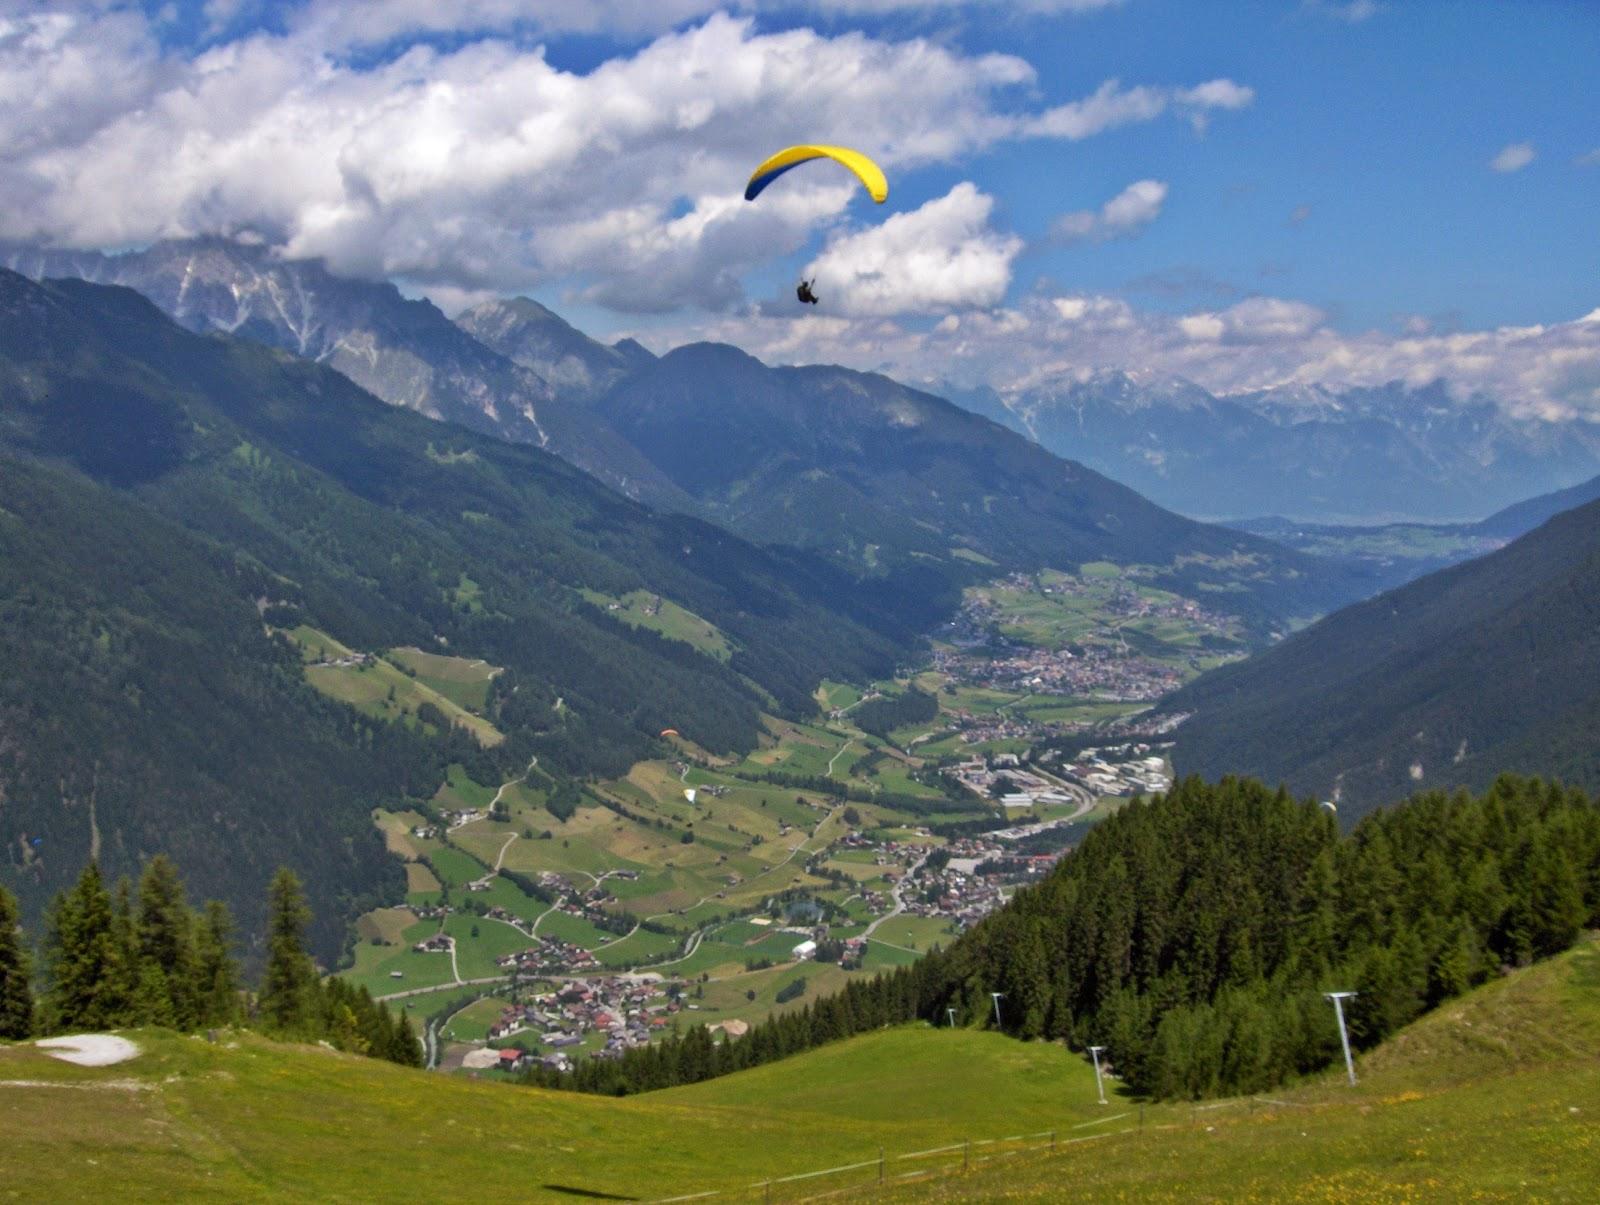 Flying high in Austrian Alps